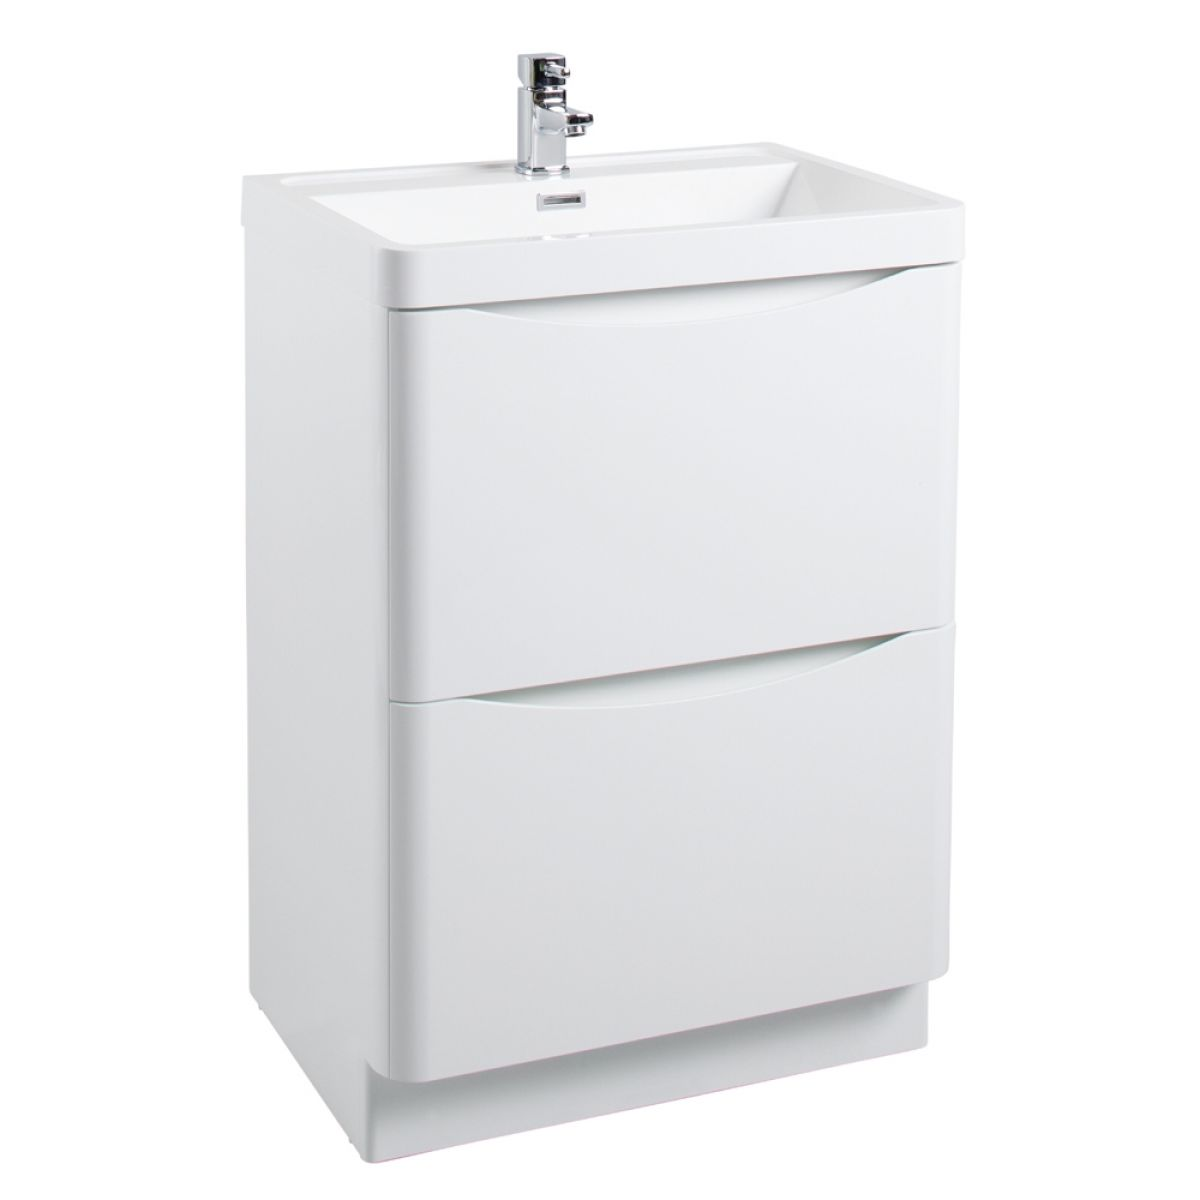 Bali Gloss White Floor Standing Vanity Unit 600mm